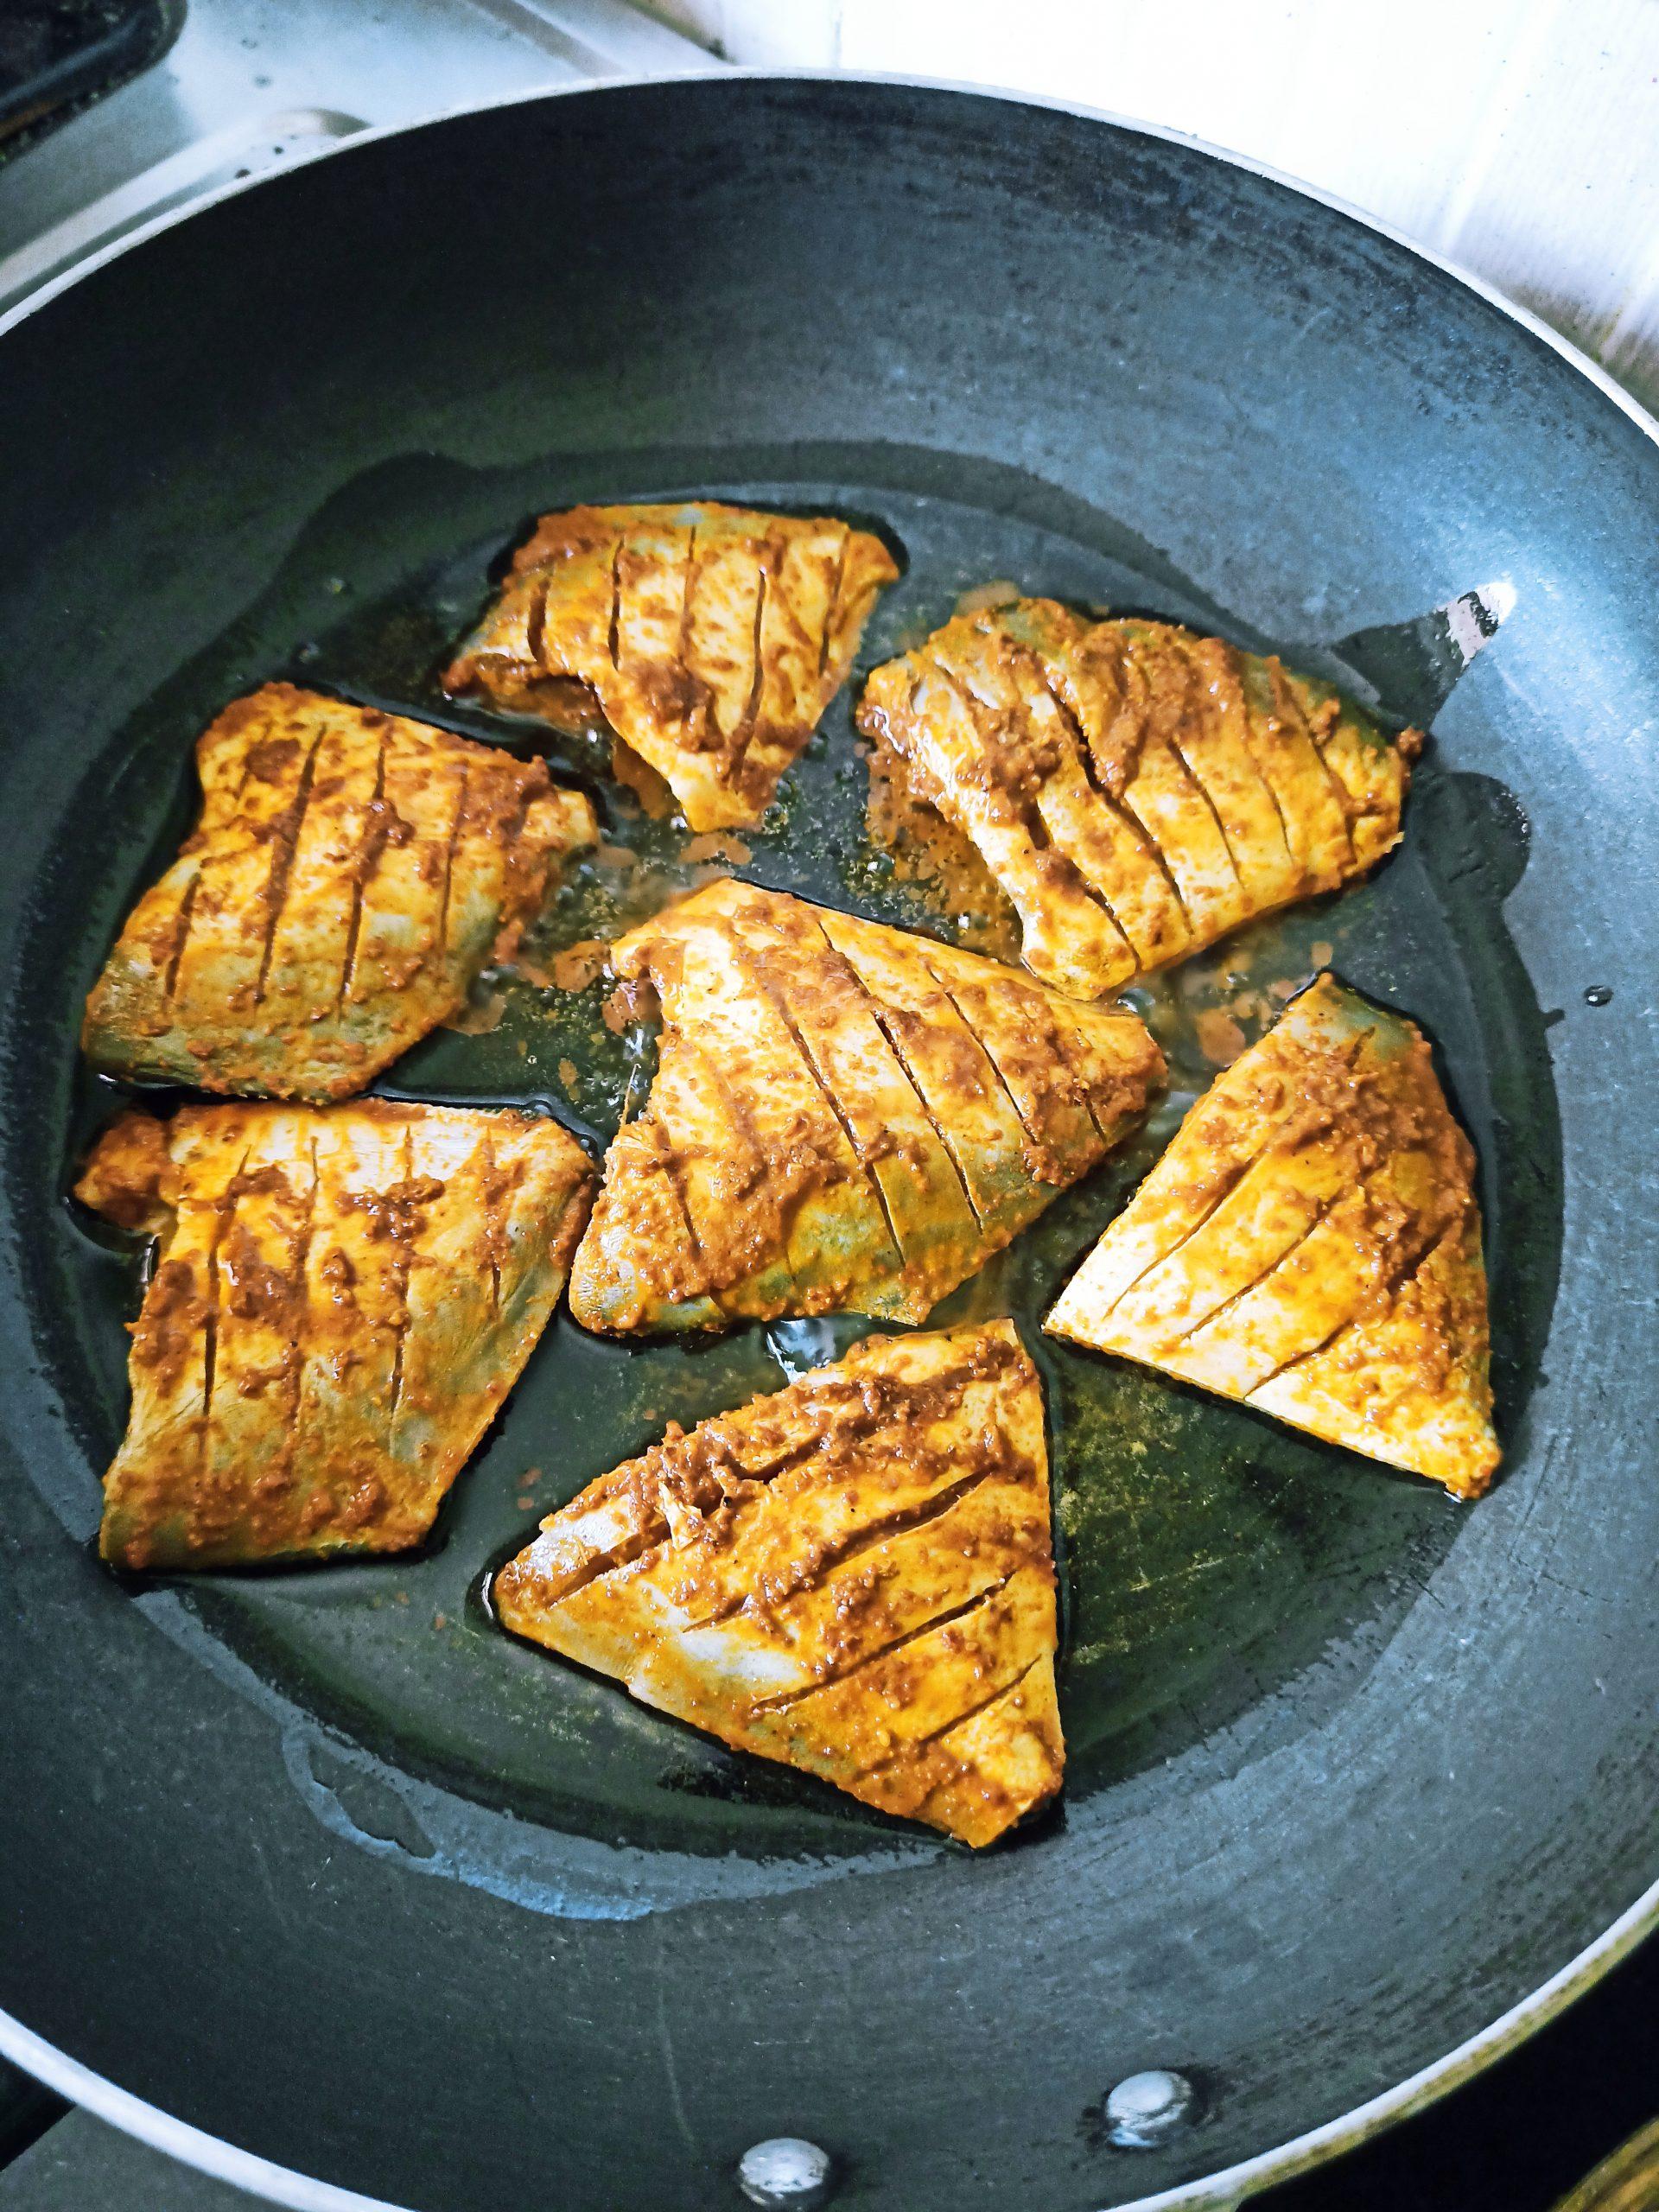 Paplet fish fry dish